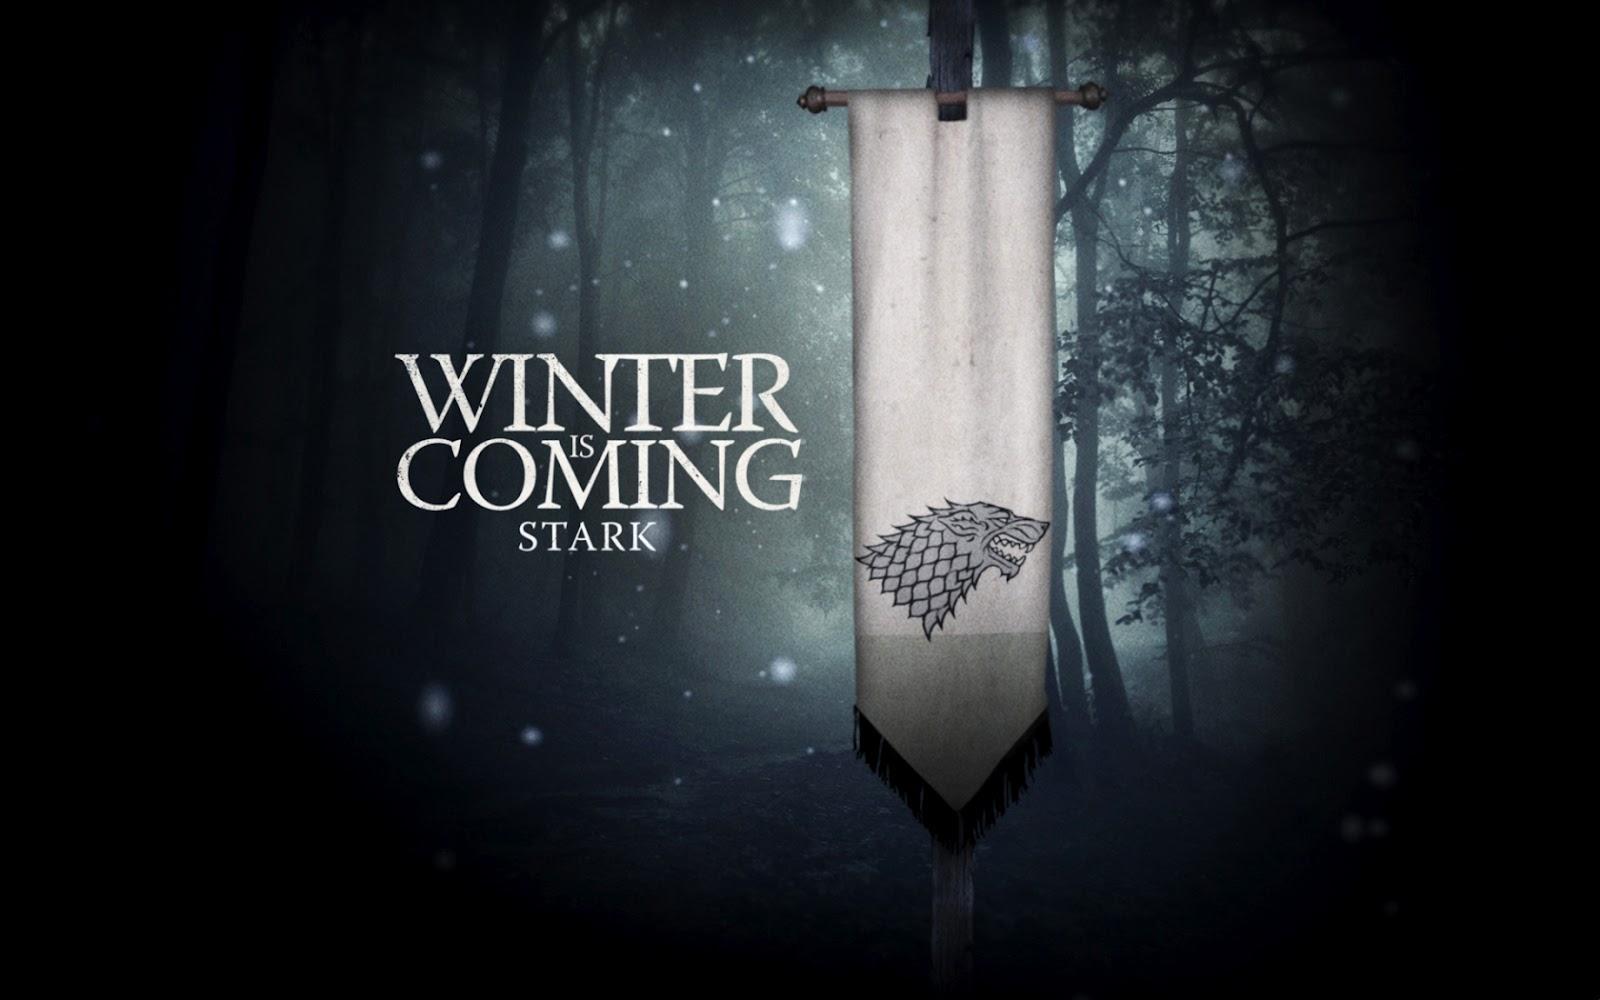 Game of Thrones Tv Episode HD Wallpapers Download Wallpapers 1600x1000